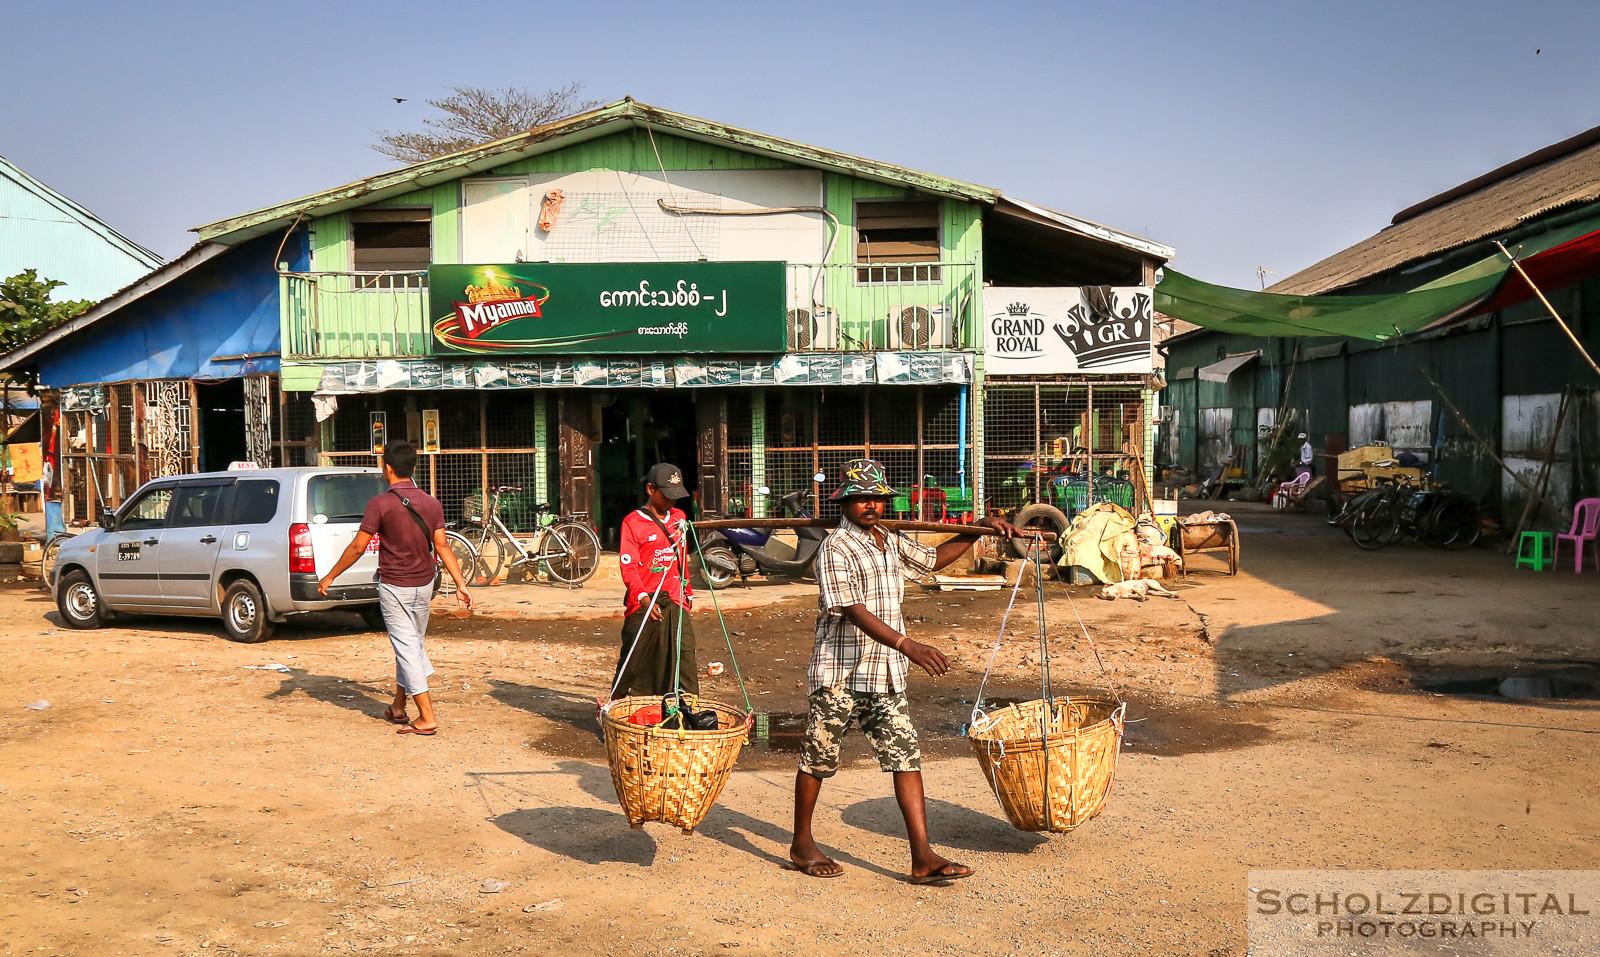 Shop, Myanmar, Travelling,Asia, Birma, Burma, Exploring, globetrotter, Boy, Yangon, Southeastasia, Streetphotography, travel, Travelling, travelphotography, Wanderlust